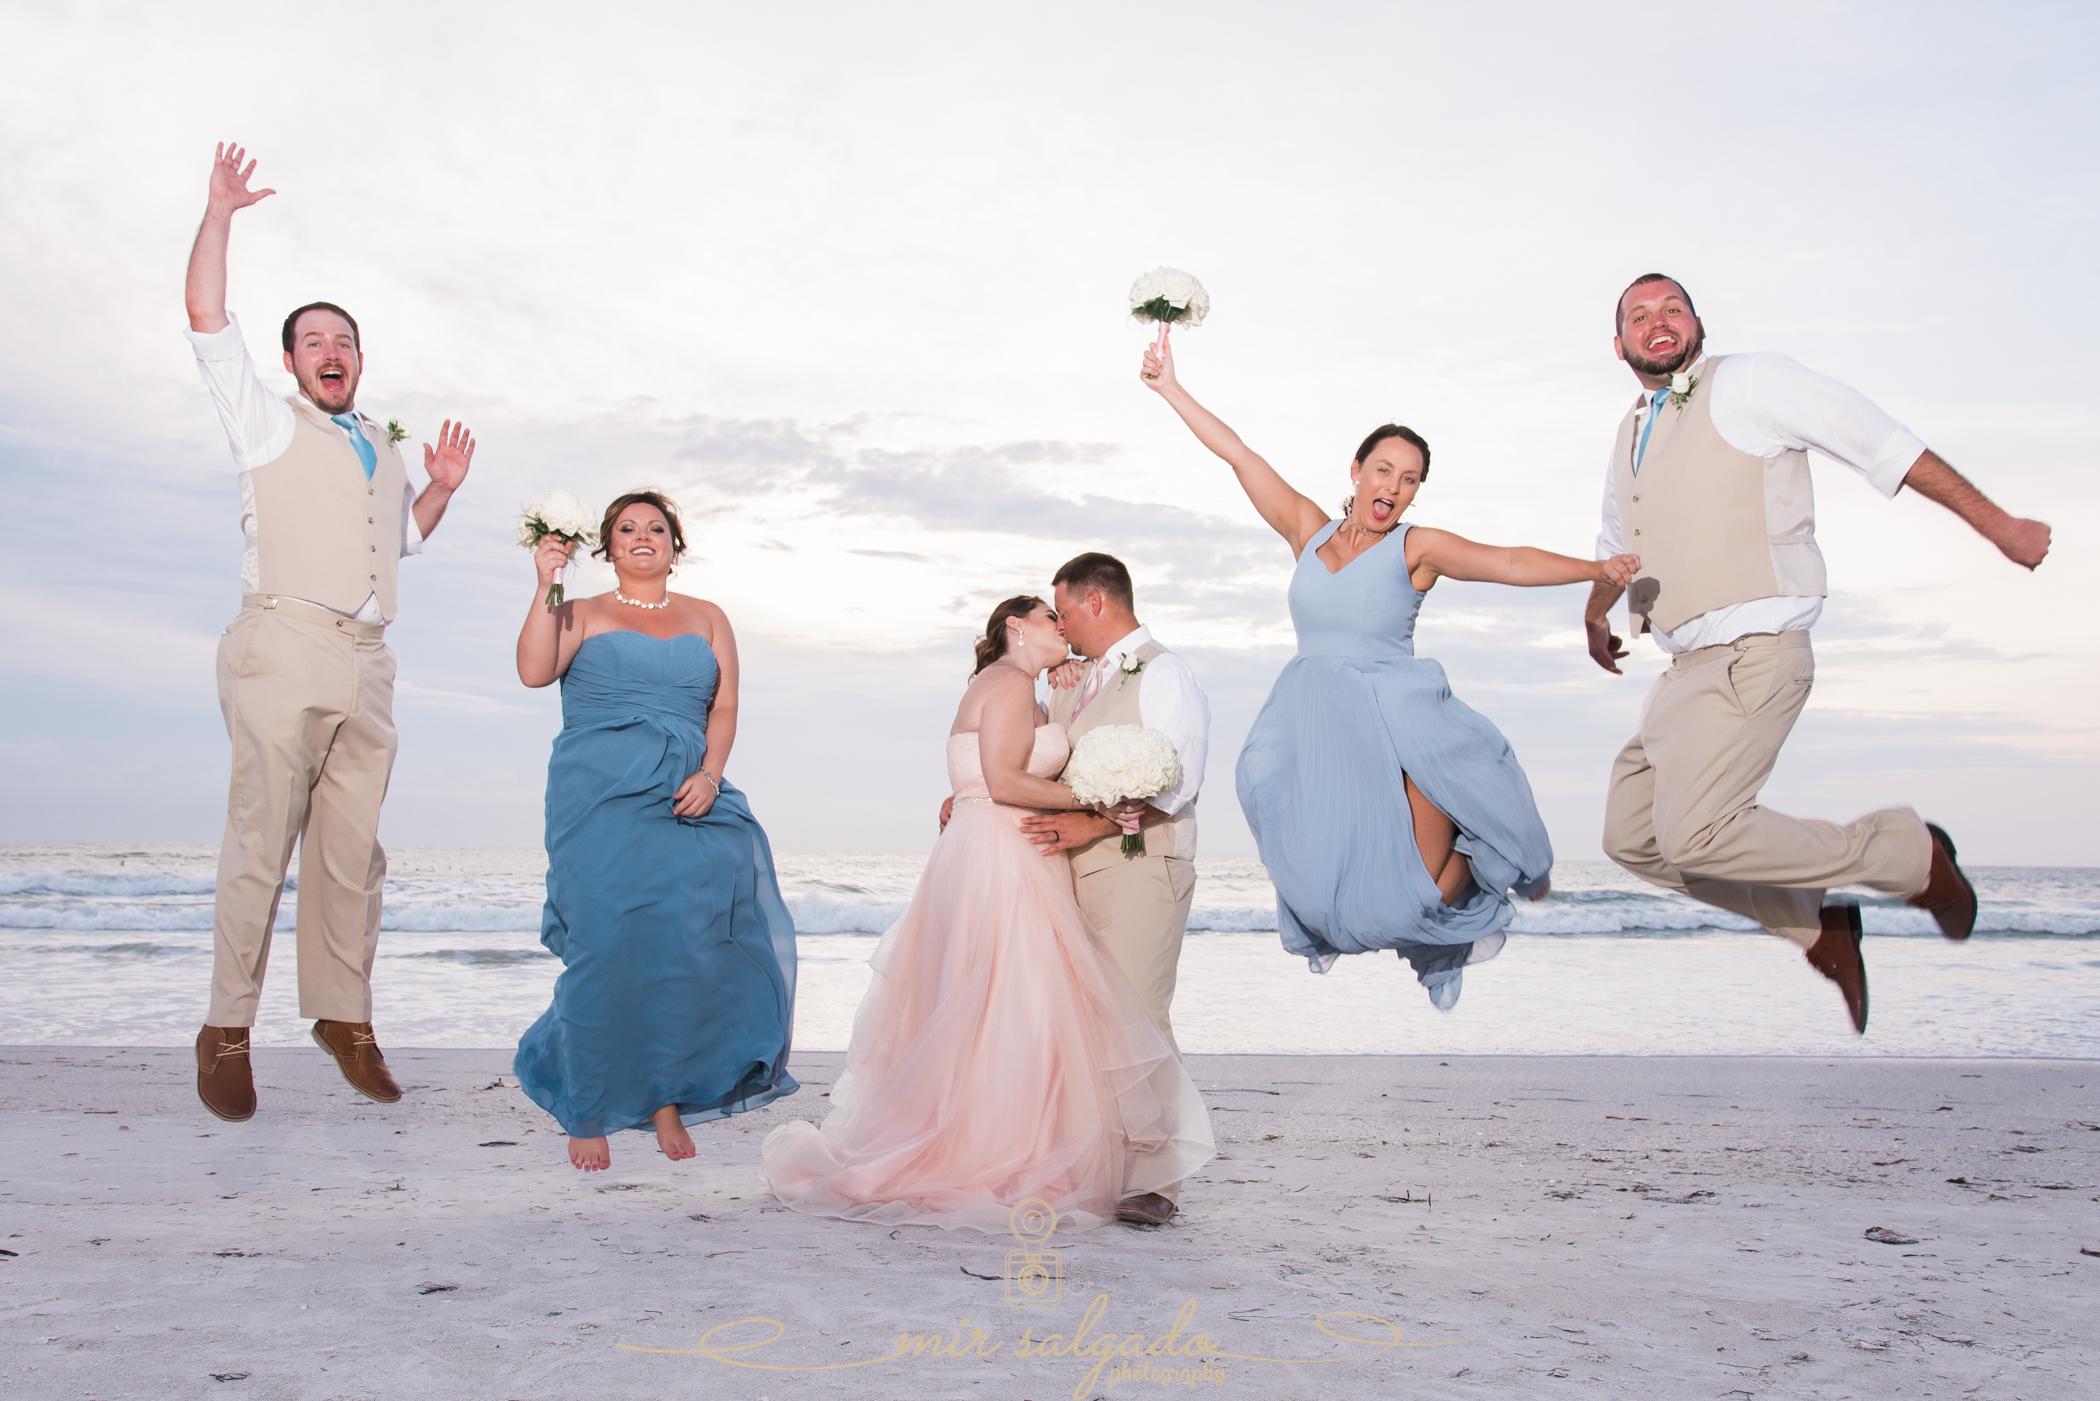 Florida-bridal-party-wedding-photo, beach-wedding-photography